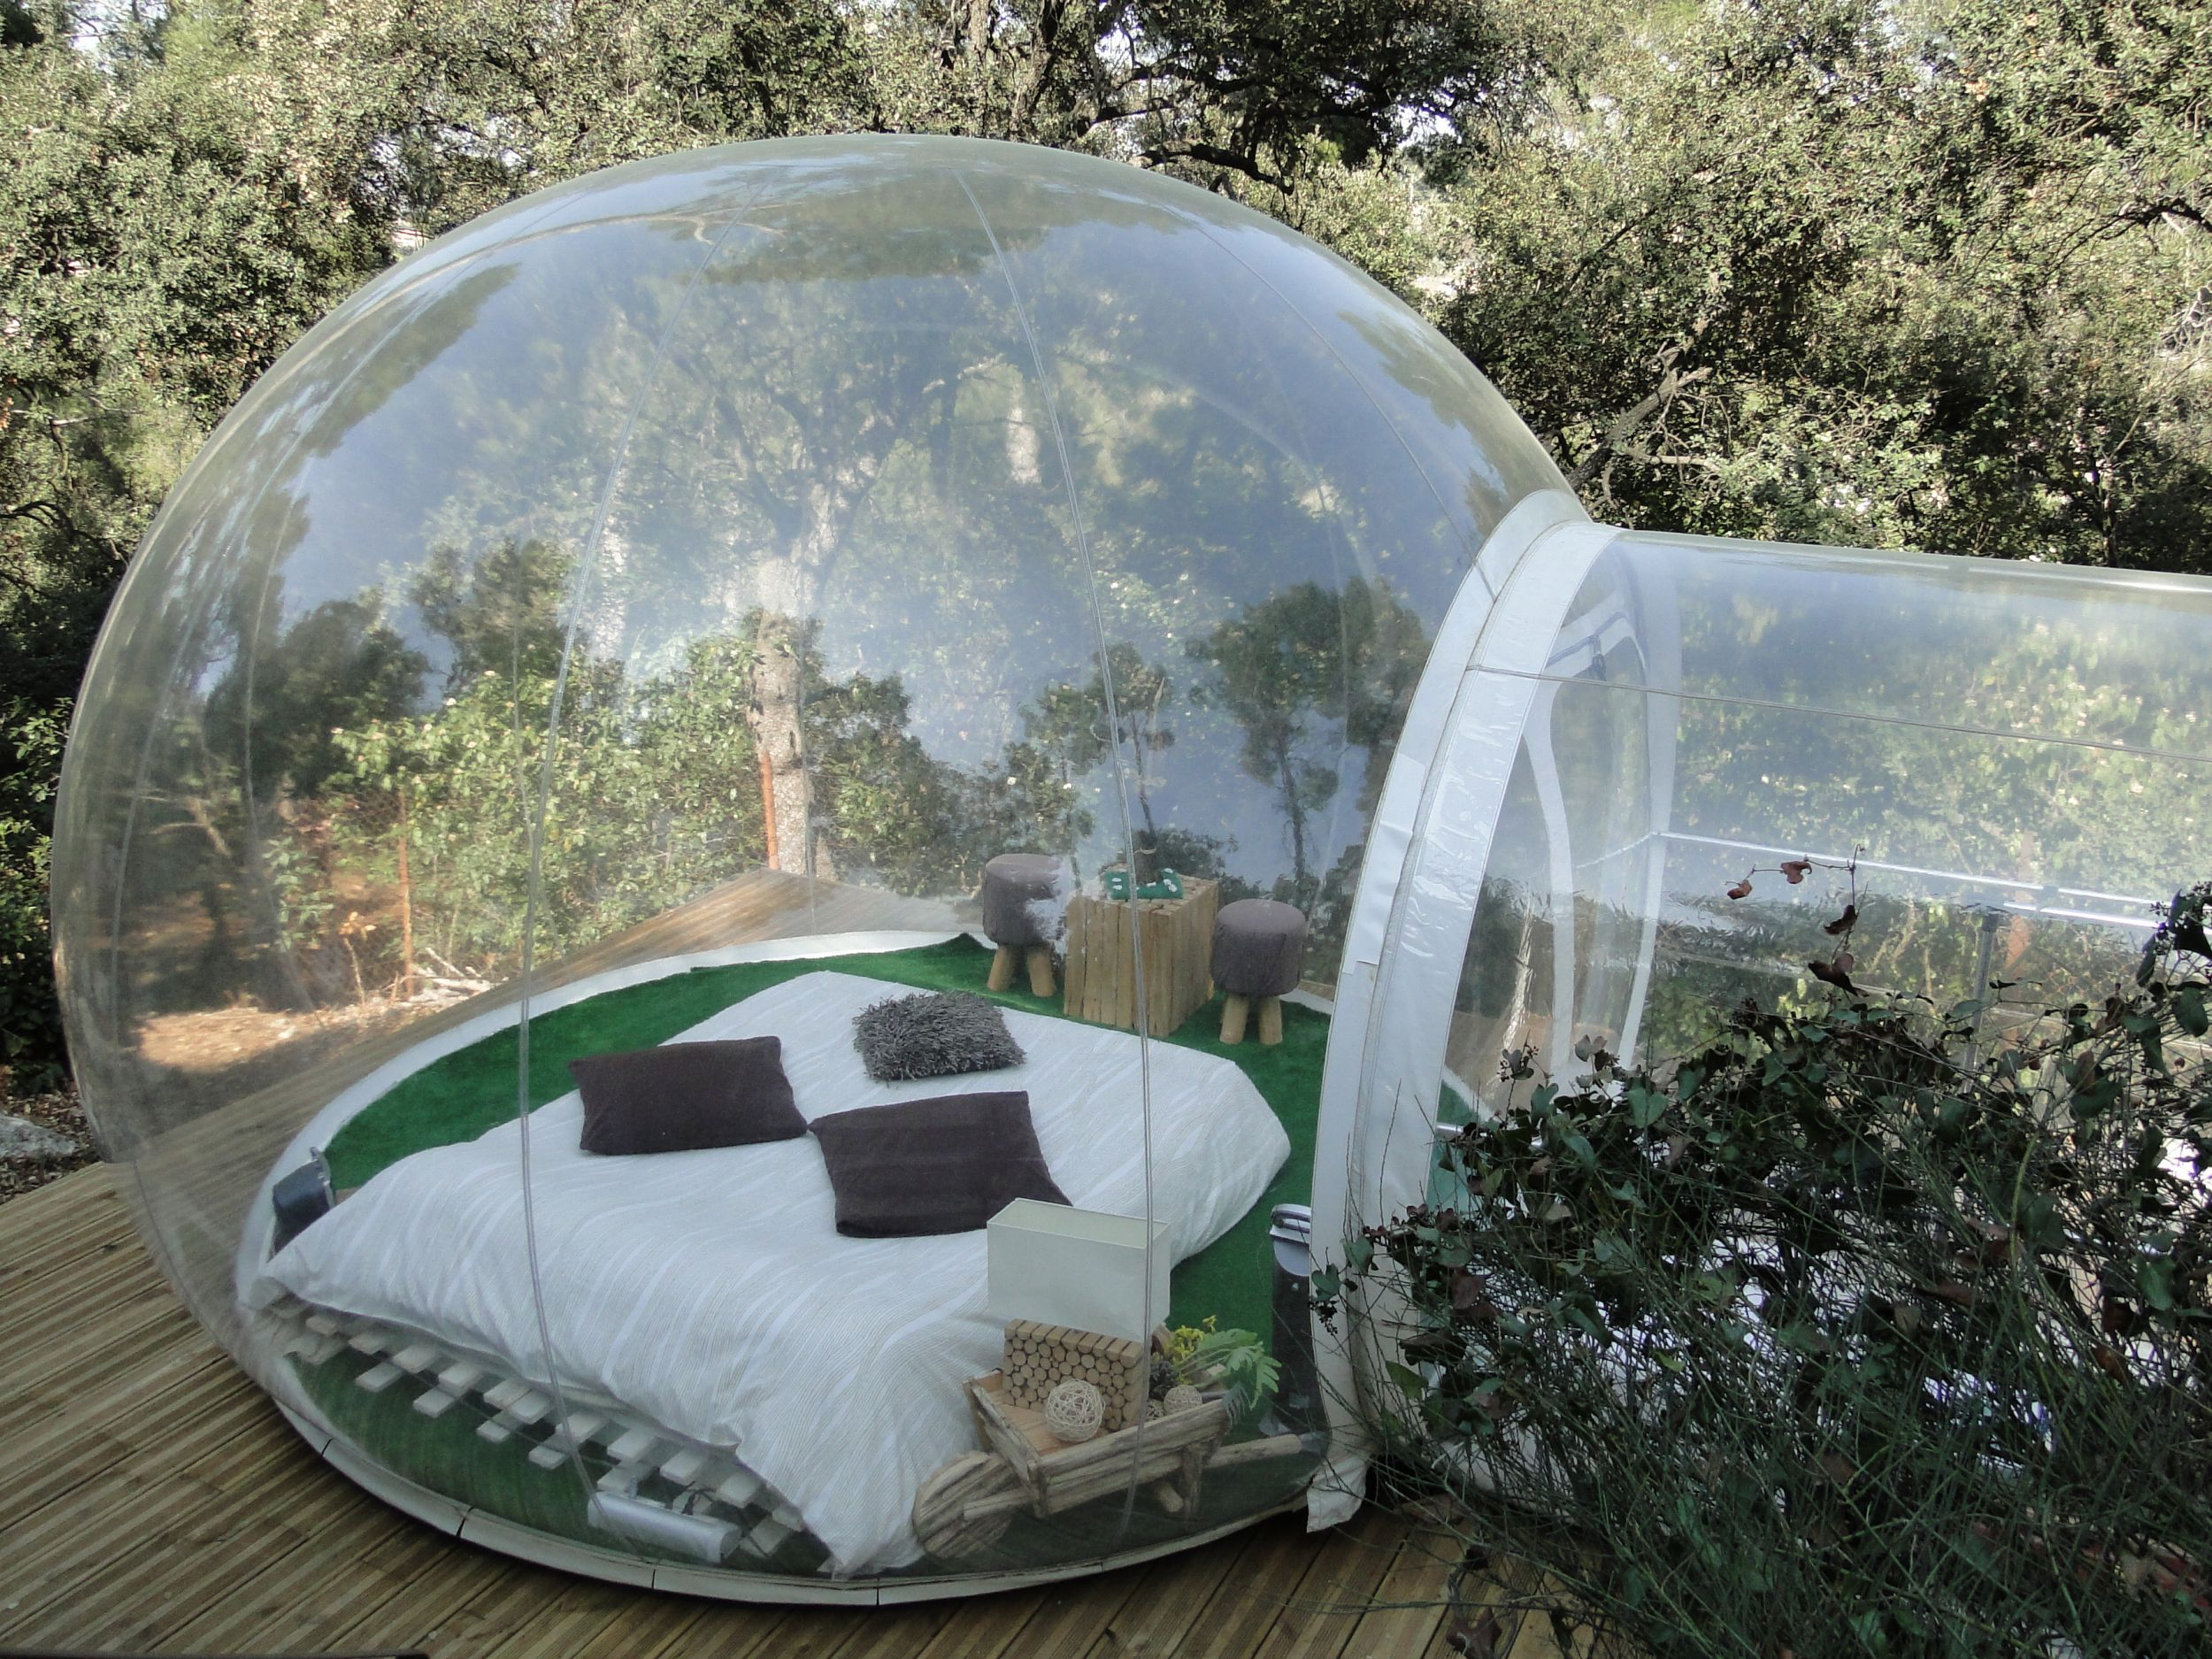 Sonhos-Bubble-Hotel-Marseille (1)